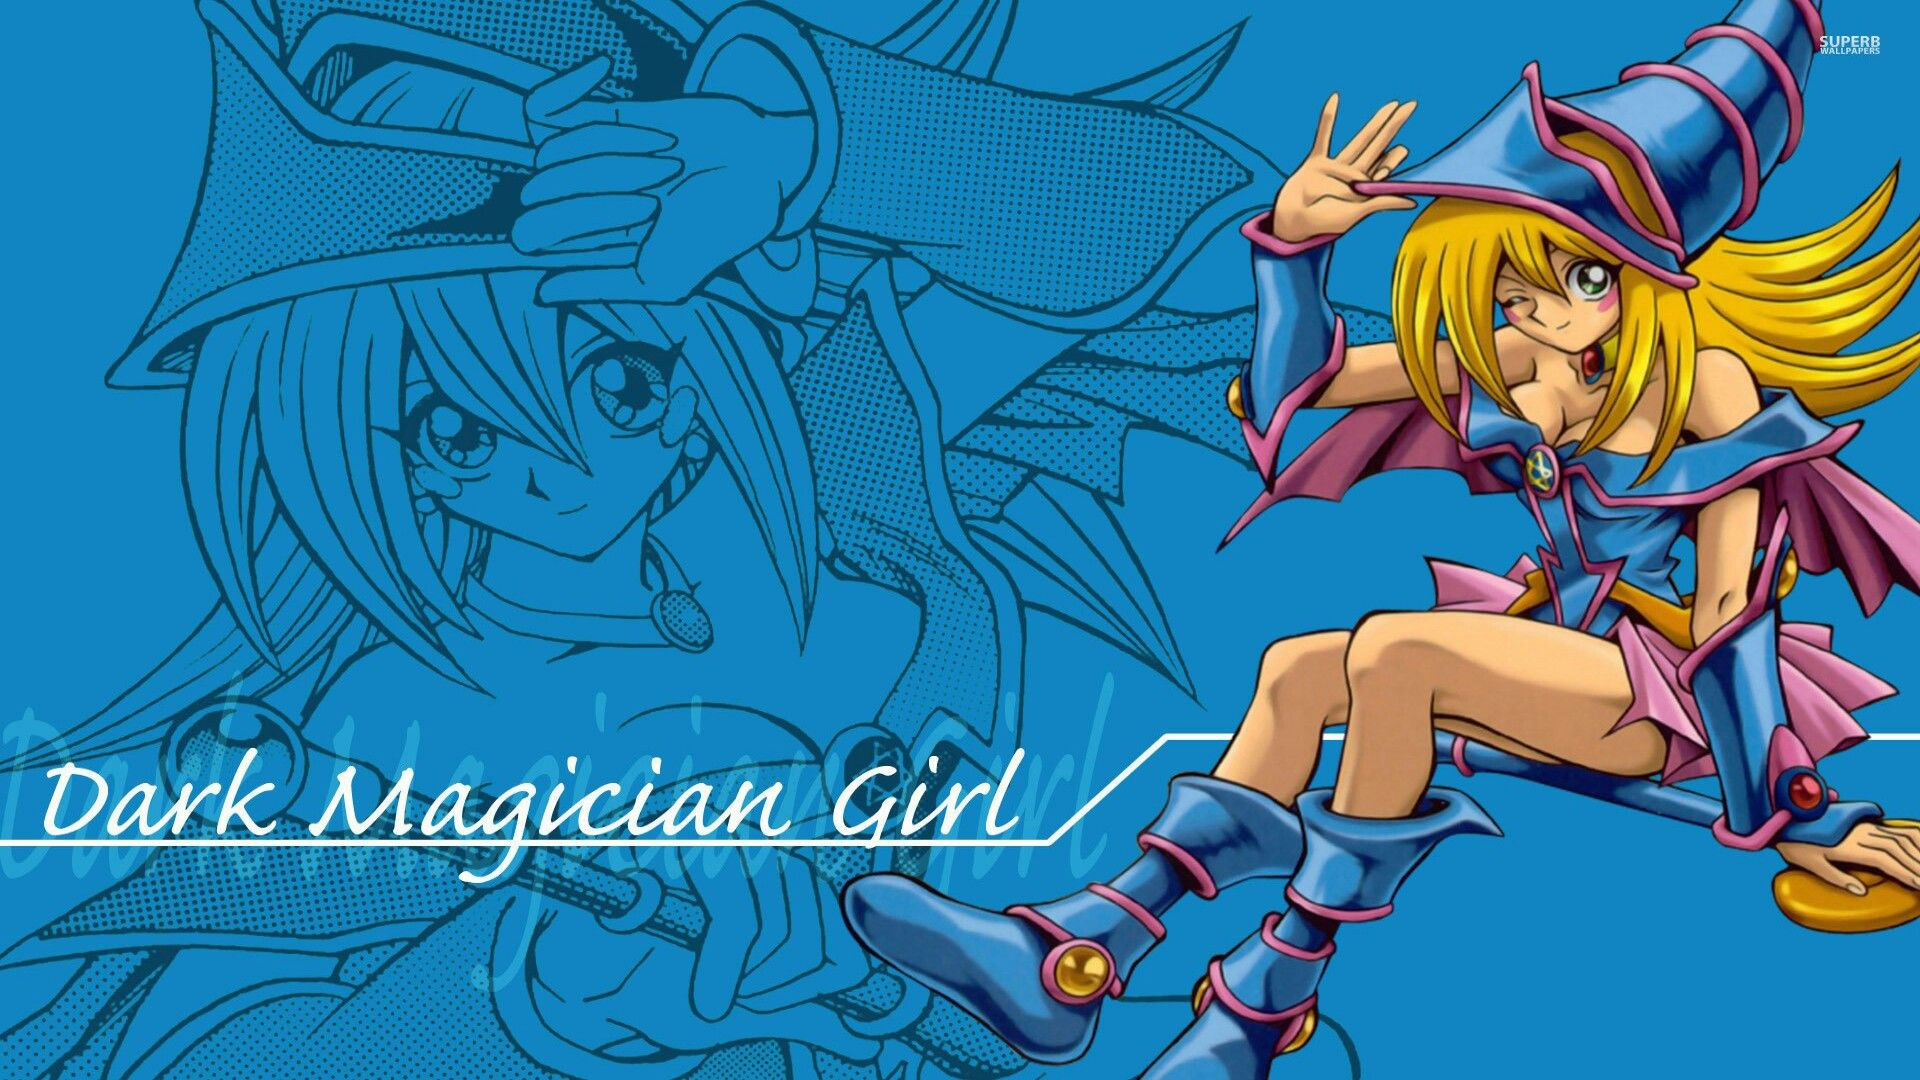 Dark Magician Girl Yu Gi Oh Wallpaper Anime Anime Hd Anime